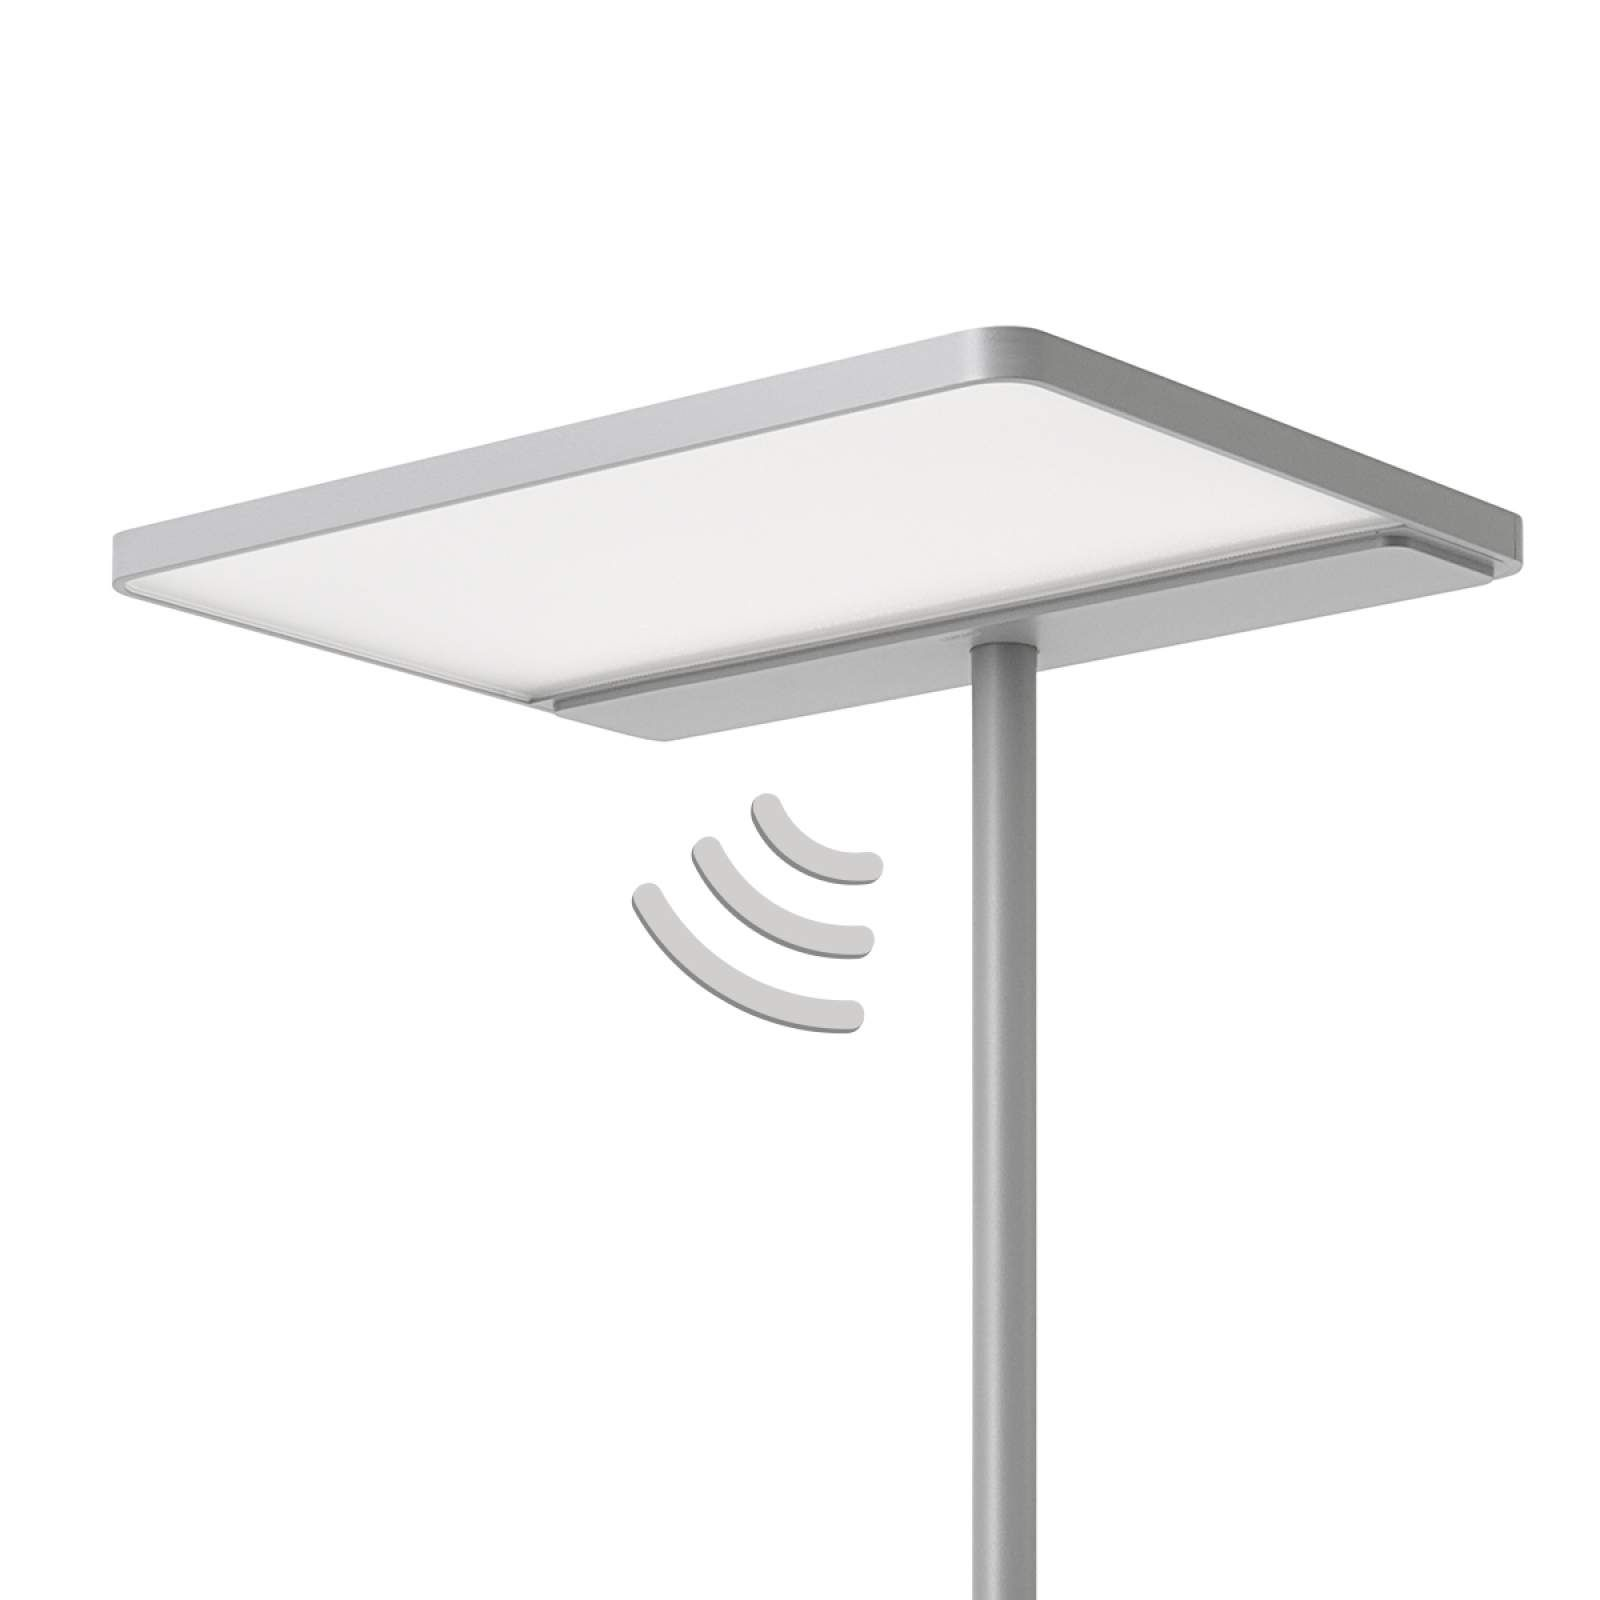 Büro-Stehlampe Linea-F mit Sensor grau